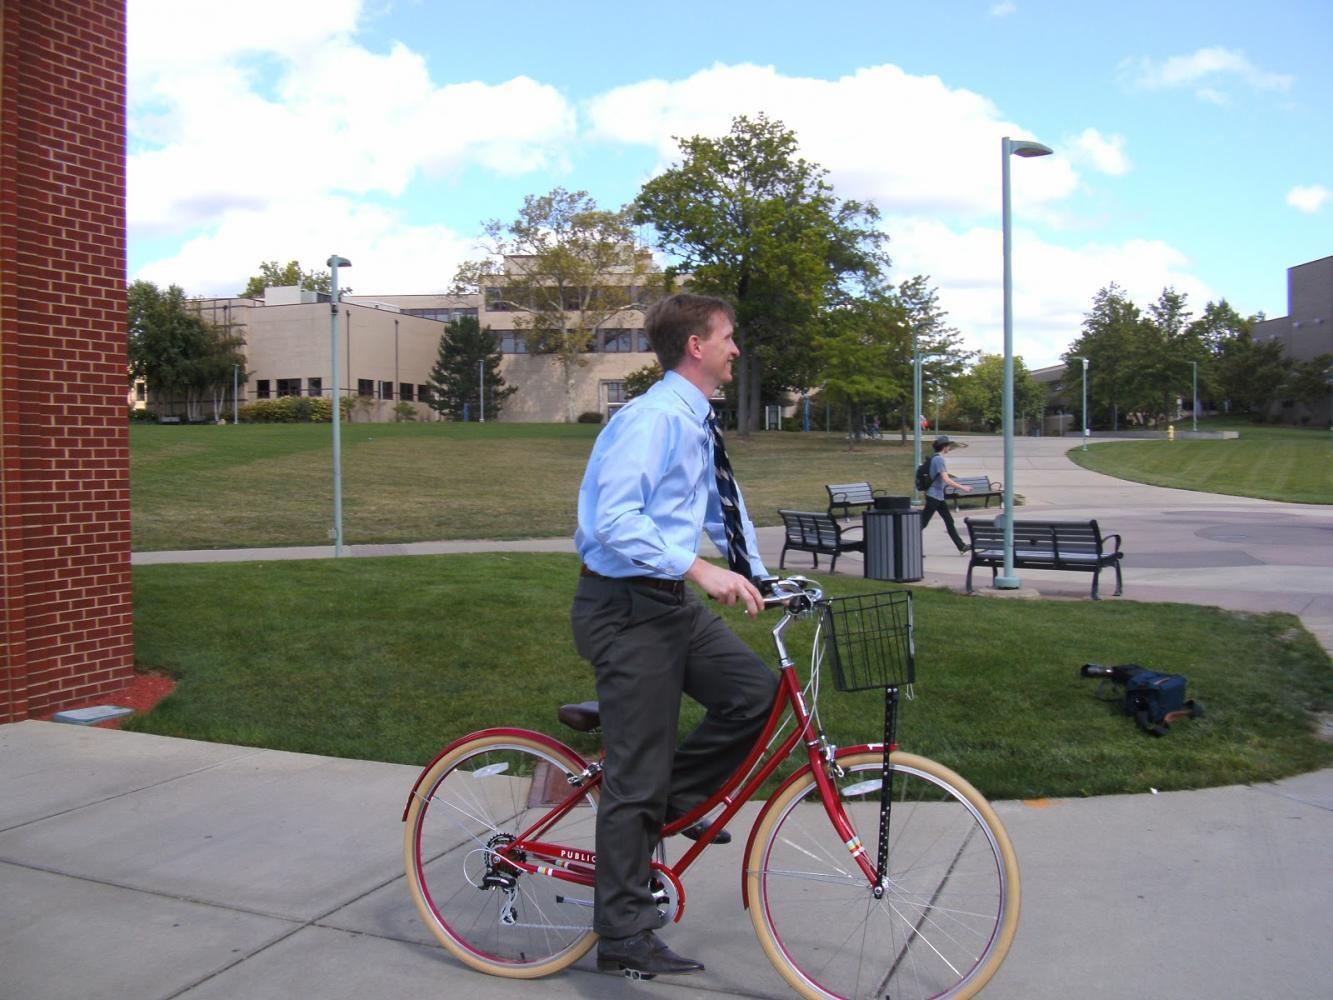 President+Wilson+rides+a+bike.